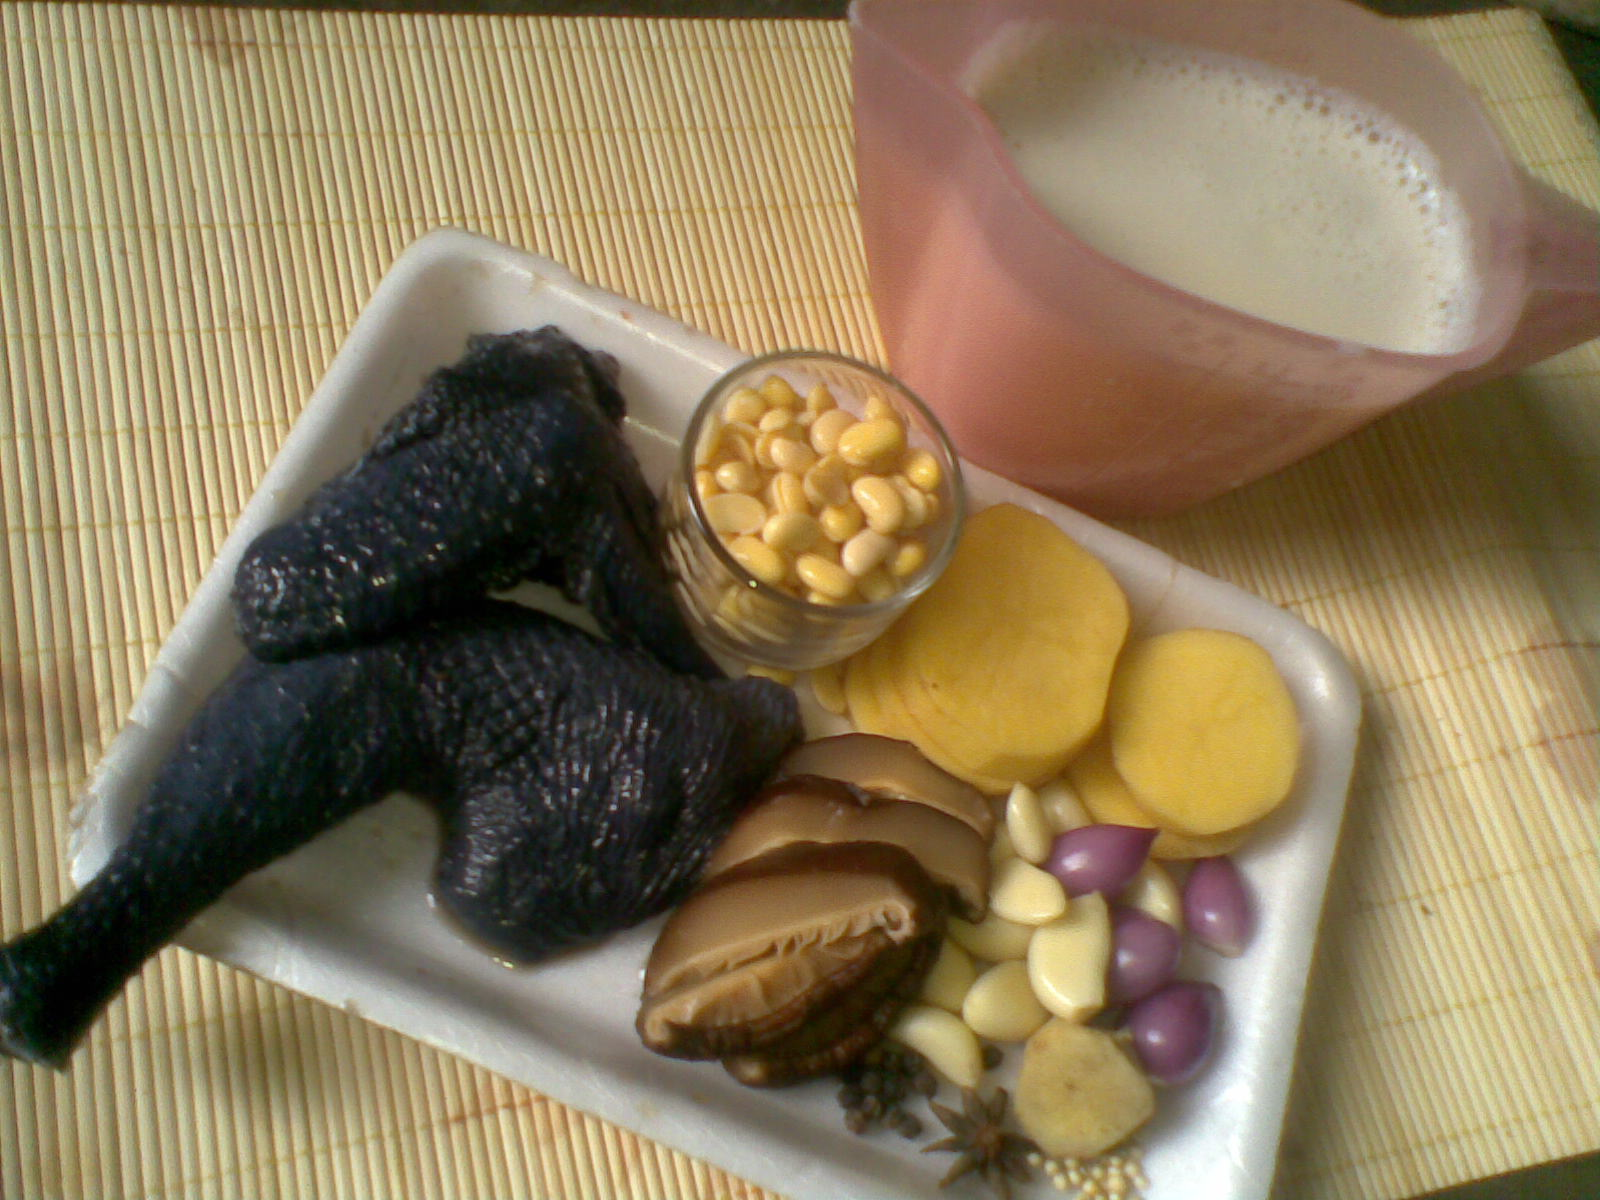 Resep sup ayam hitam/kapas susu kedelai a.k.a silkie chicken with soya ...